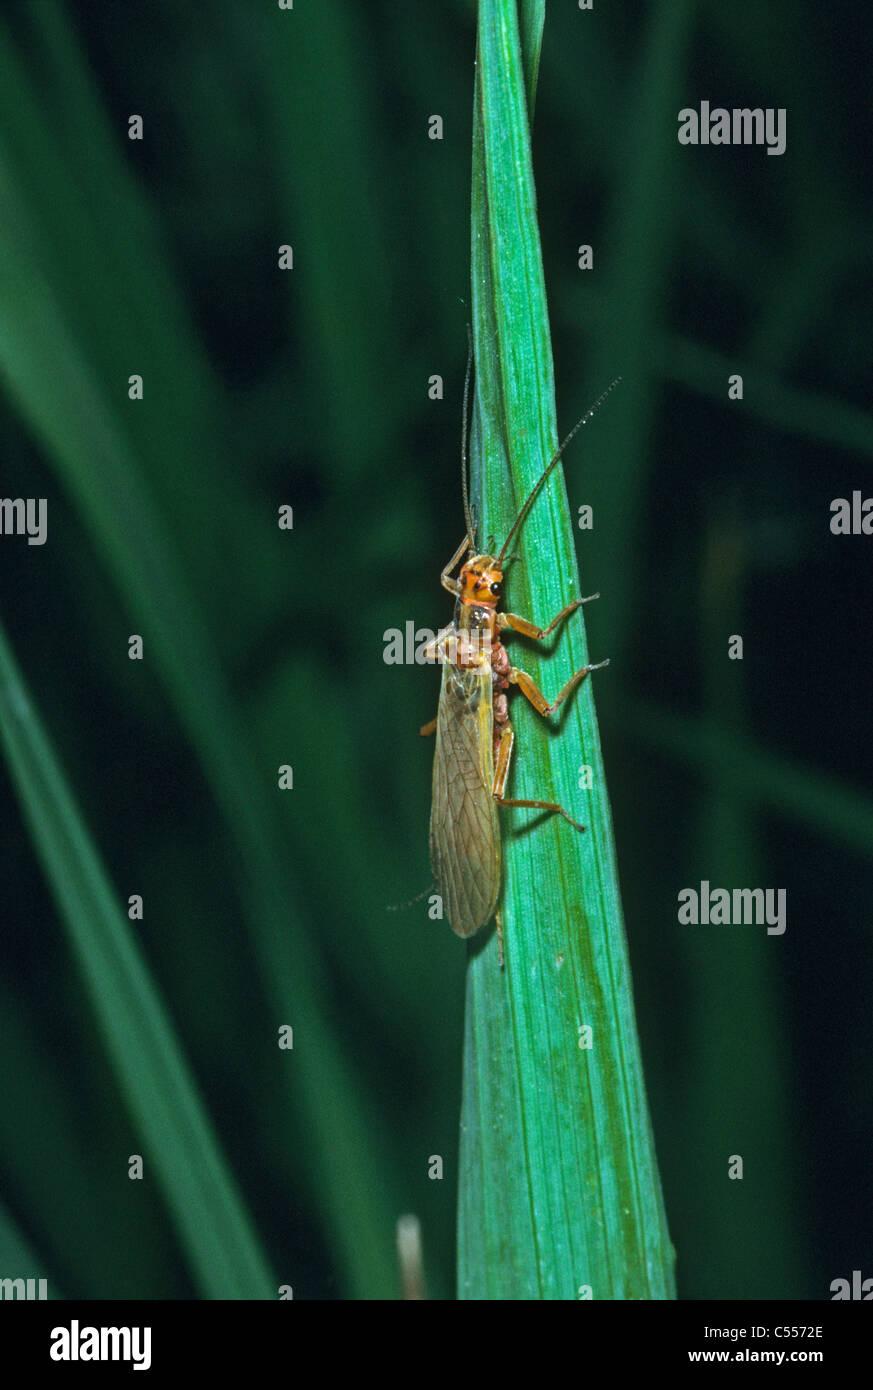 Golden Stonefly (Hesperoperla pacifica) at rest on grass blade near mountain creek, Mt. Evans Wilderness area, Colorado - Stock Image